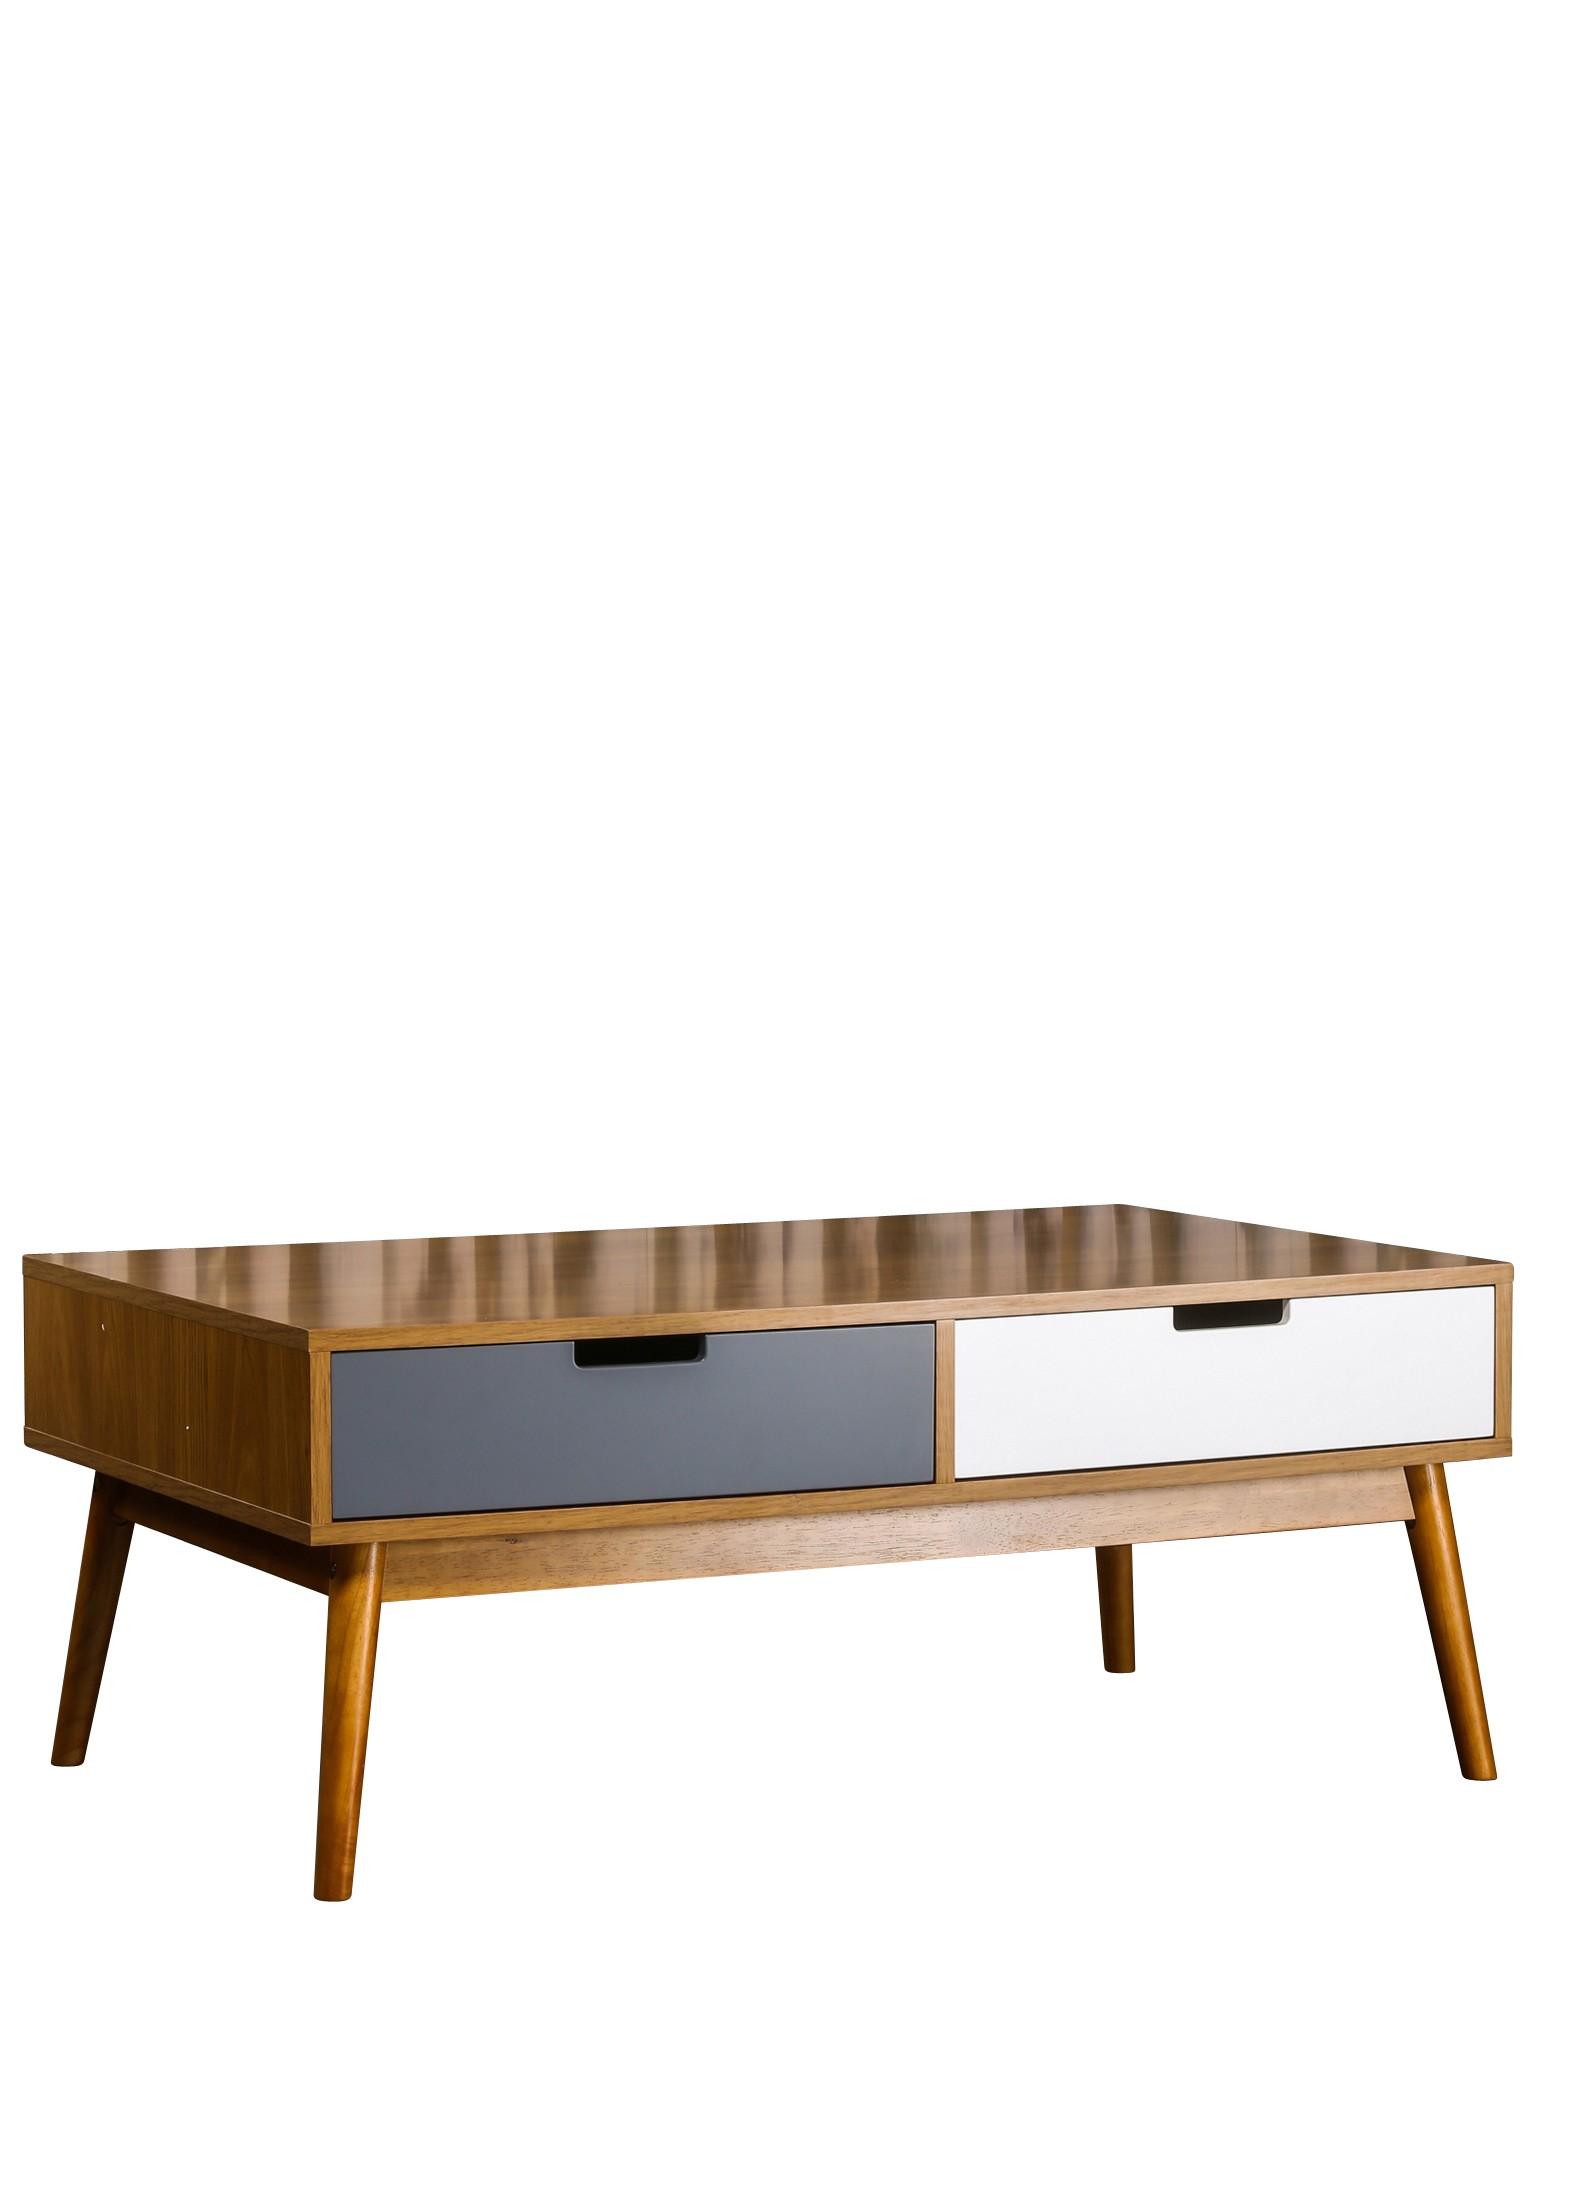 Table basse vintage double plateau quilda